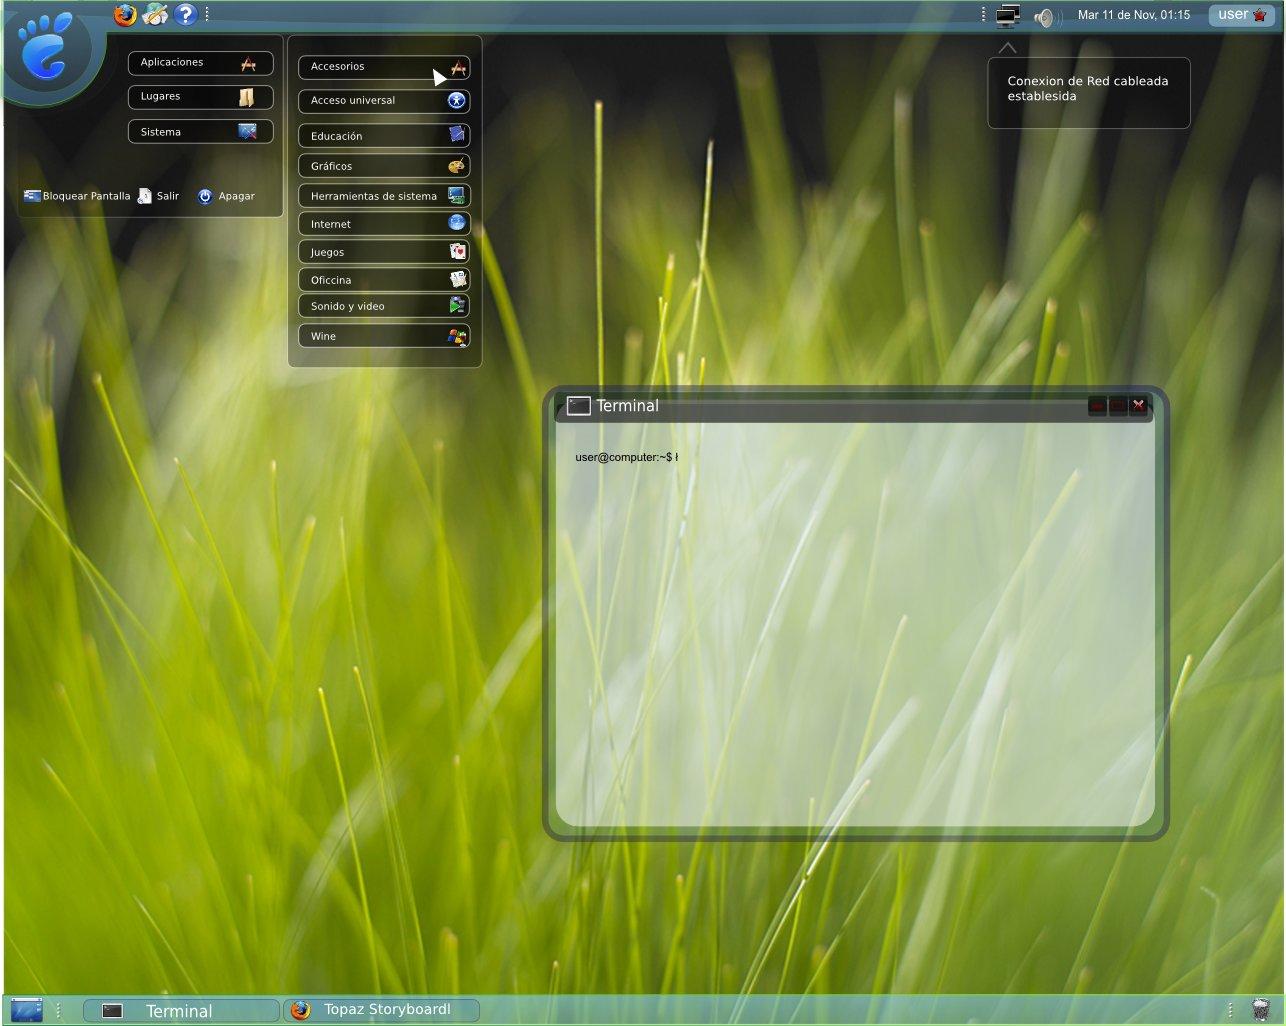 http://www.abclinuxu.cz/images/screenshots/6/3/130236-gnome-3-jak-bude-vypadat--53798.jpg